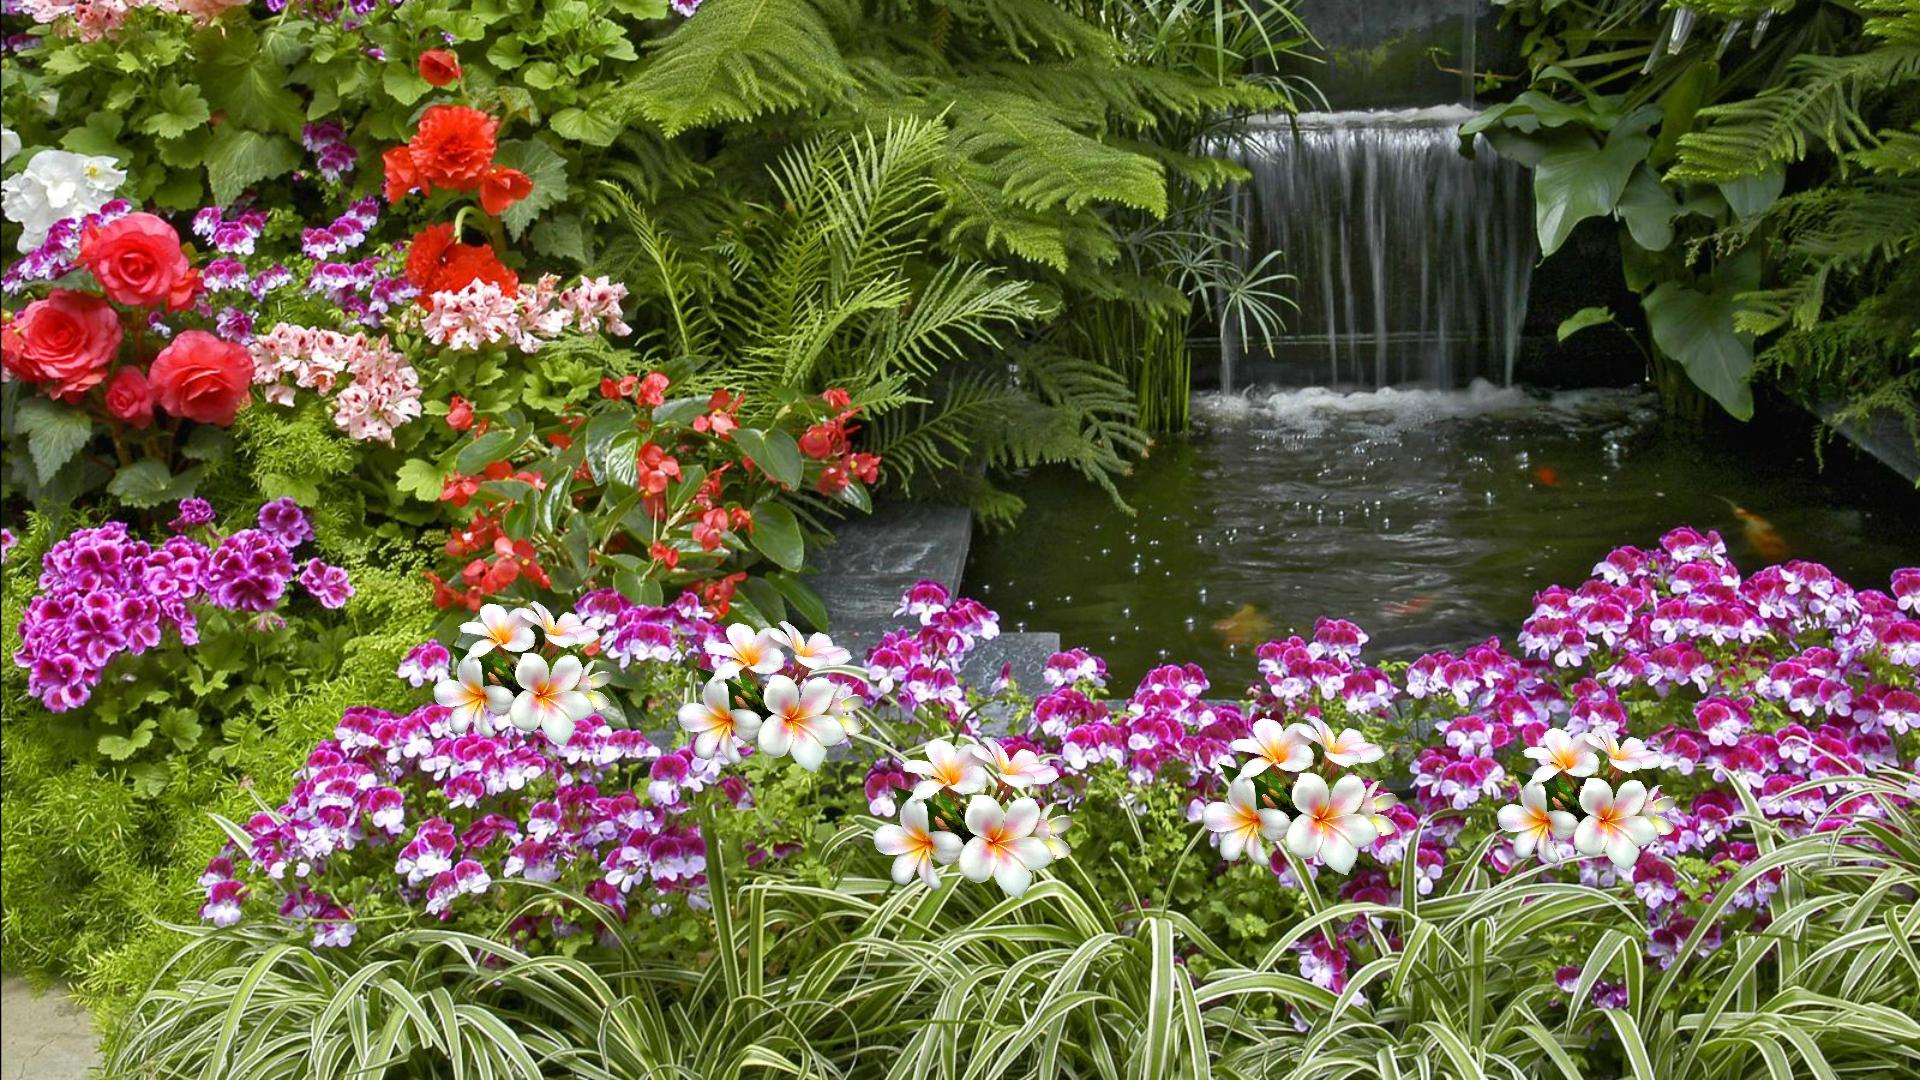 Flower Garden Wallpapers for DesktopWallpaperSafari